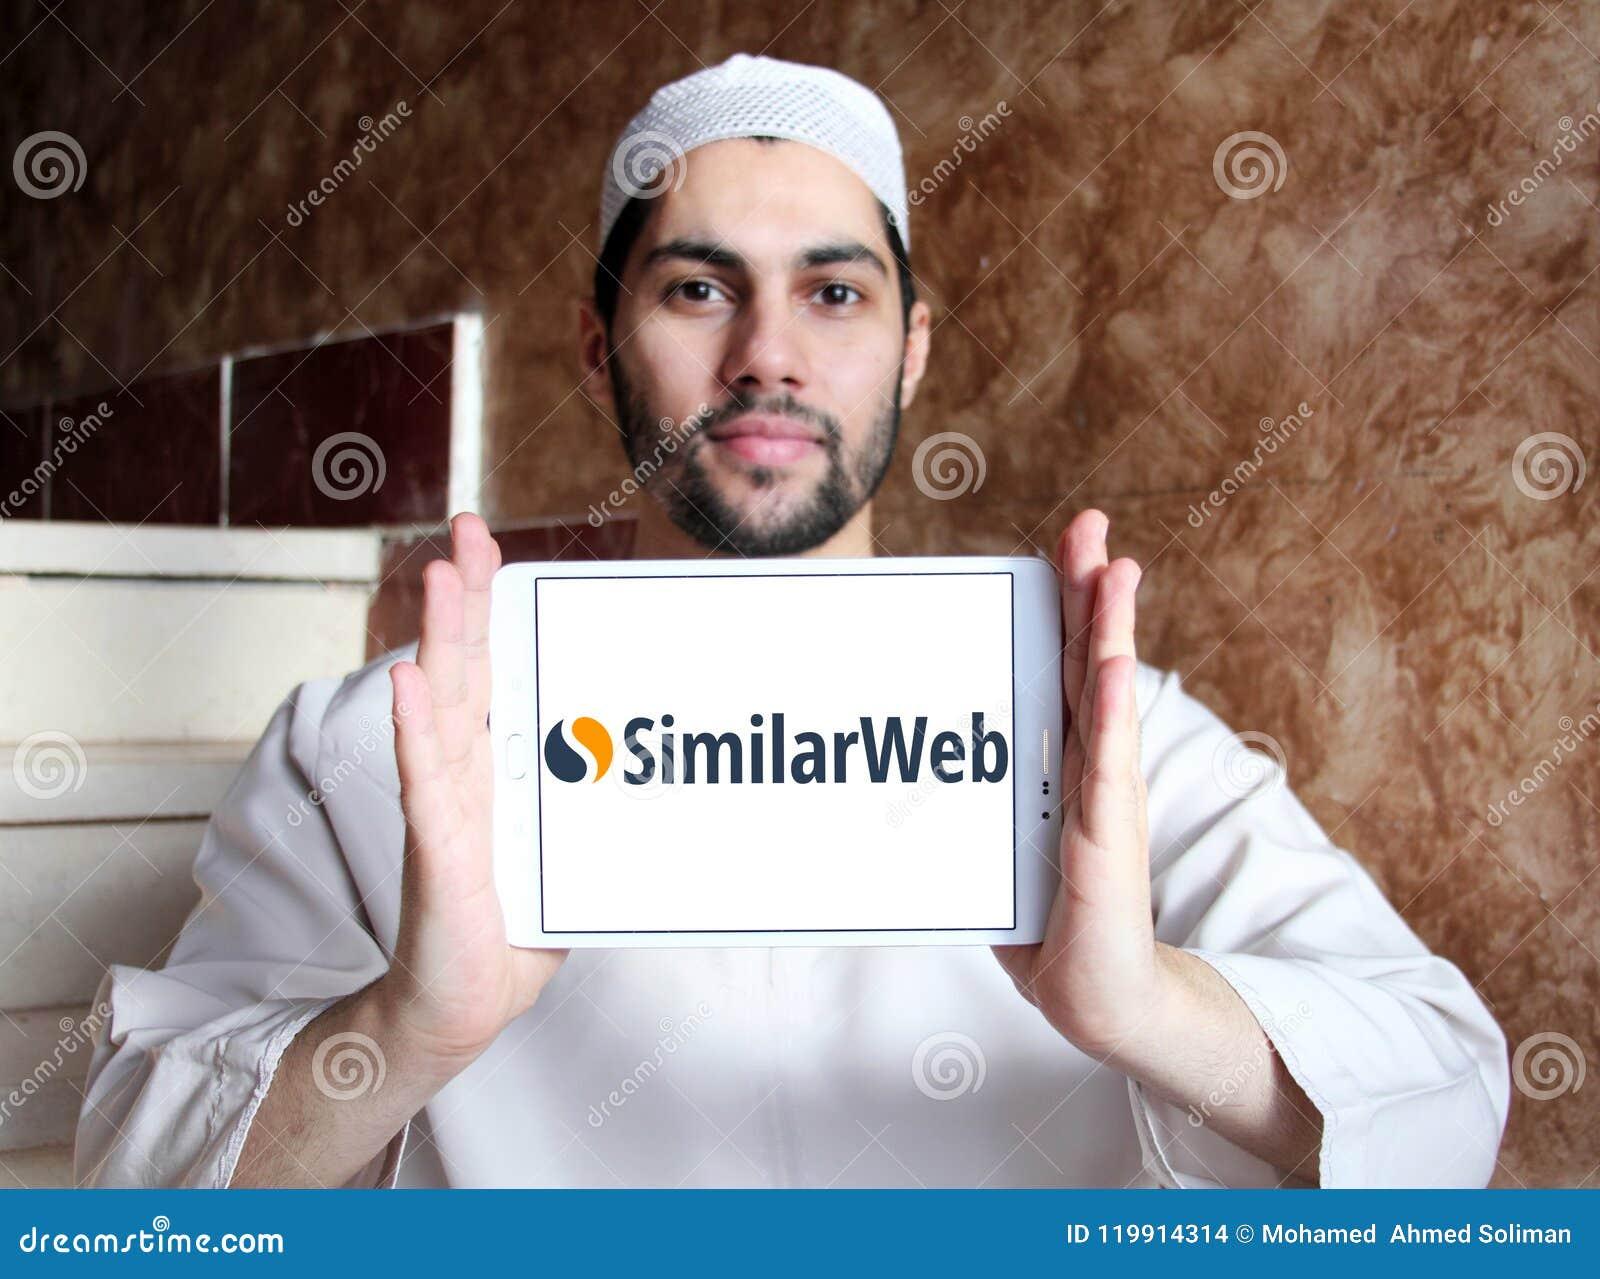 SimilarWeb företagslogo